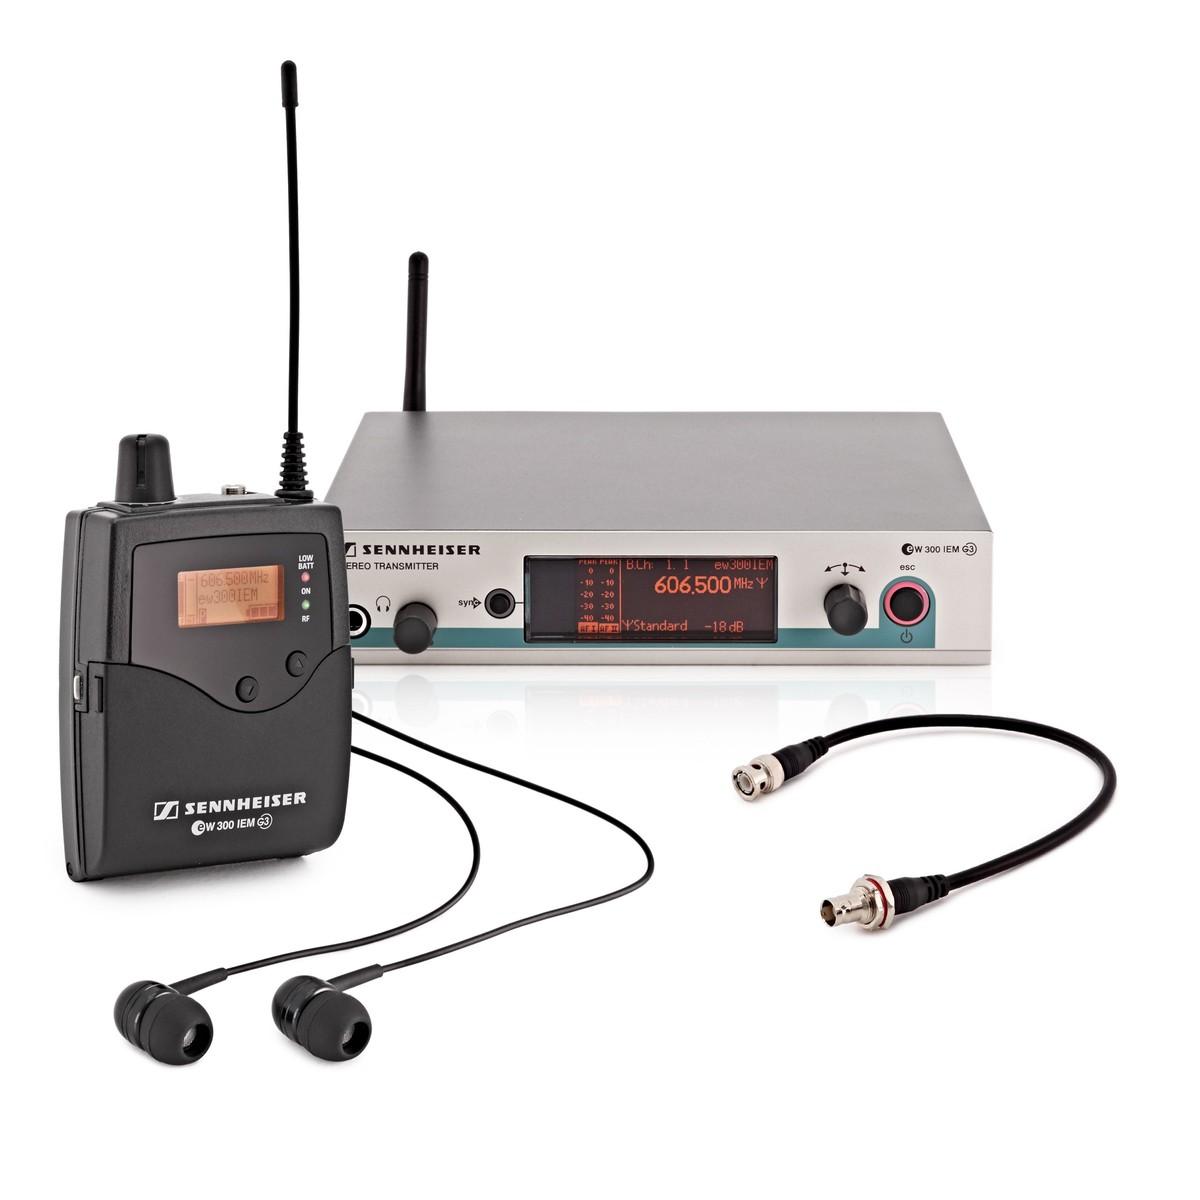 sennheiser ew 300 iem g3 gb wireless in ear monitor system at gear4music. Black Bedroom Furniture Sets. Home Design Ideas